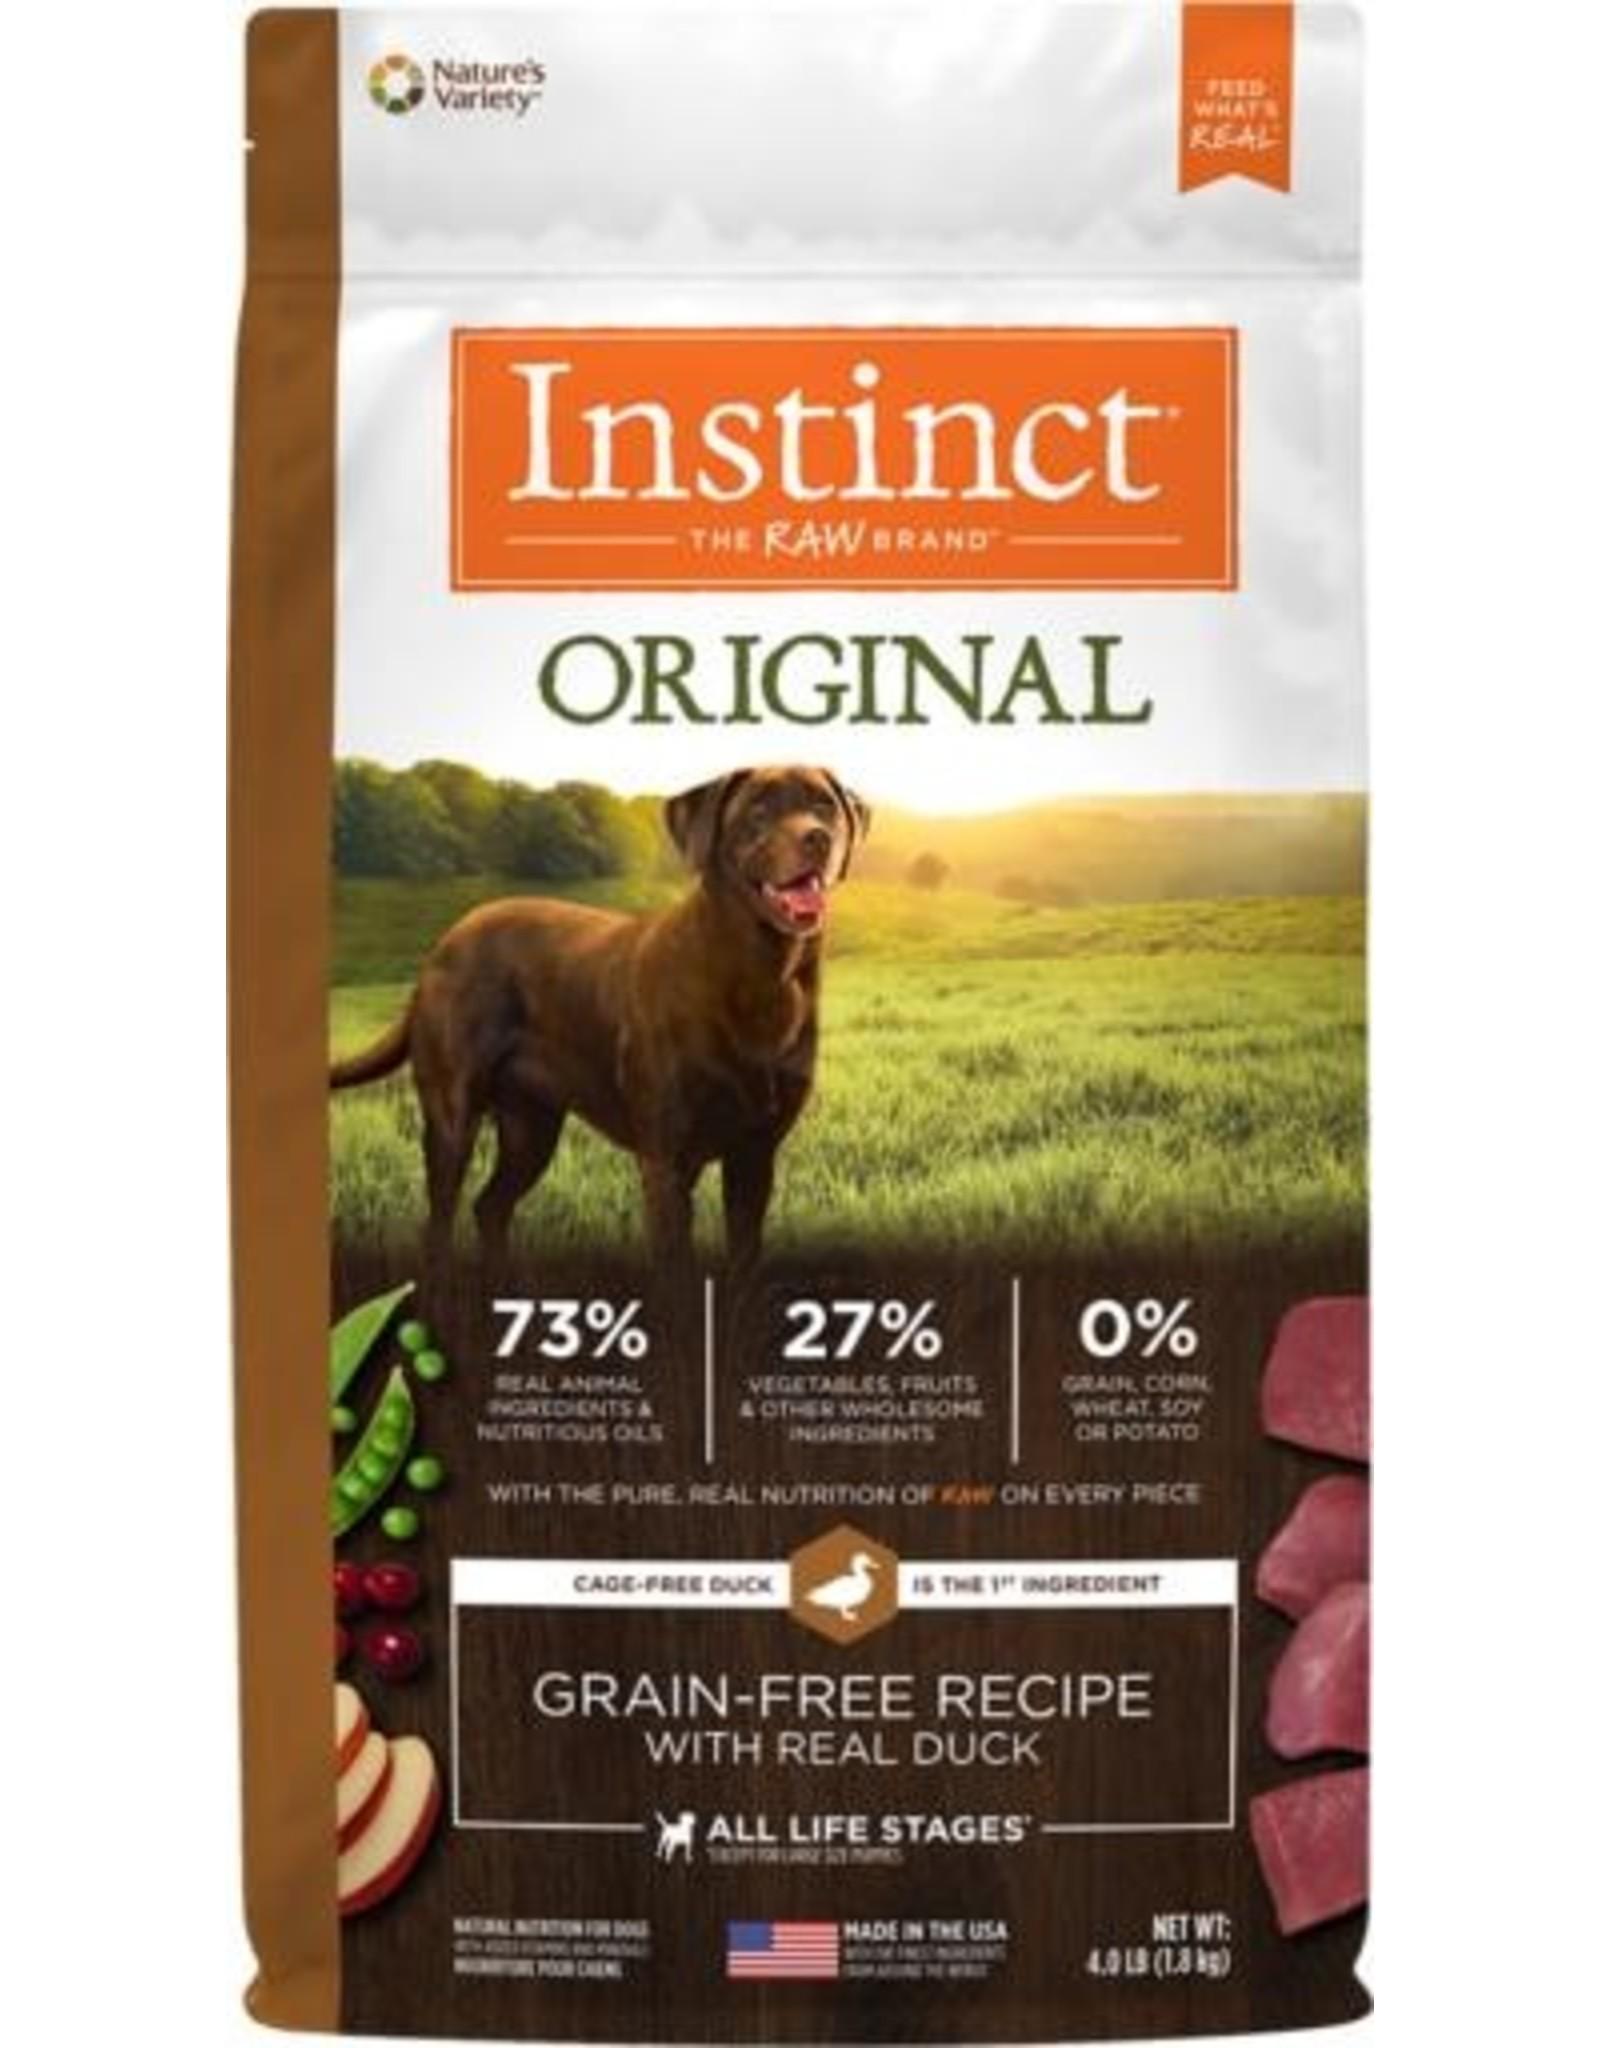 Natures Variety Instinct Original Grain-Free Recipe with Real Duck